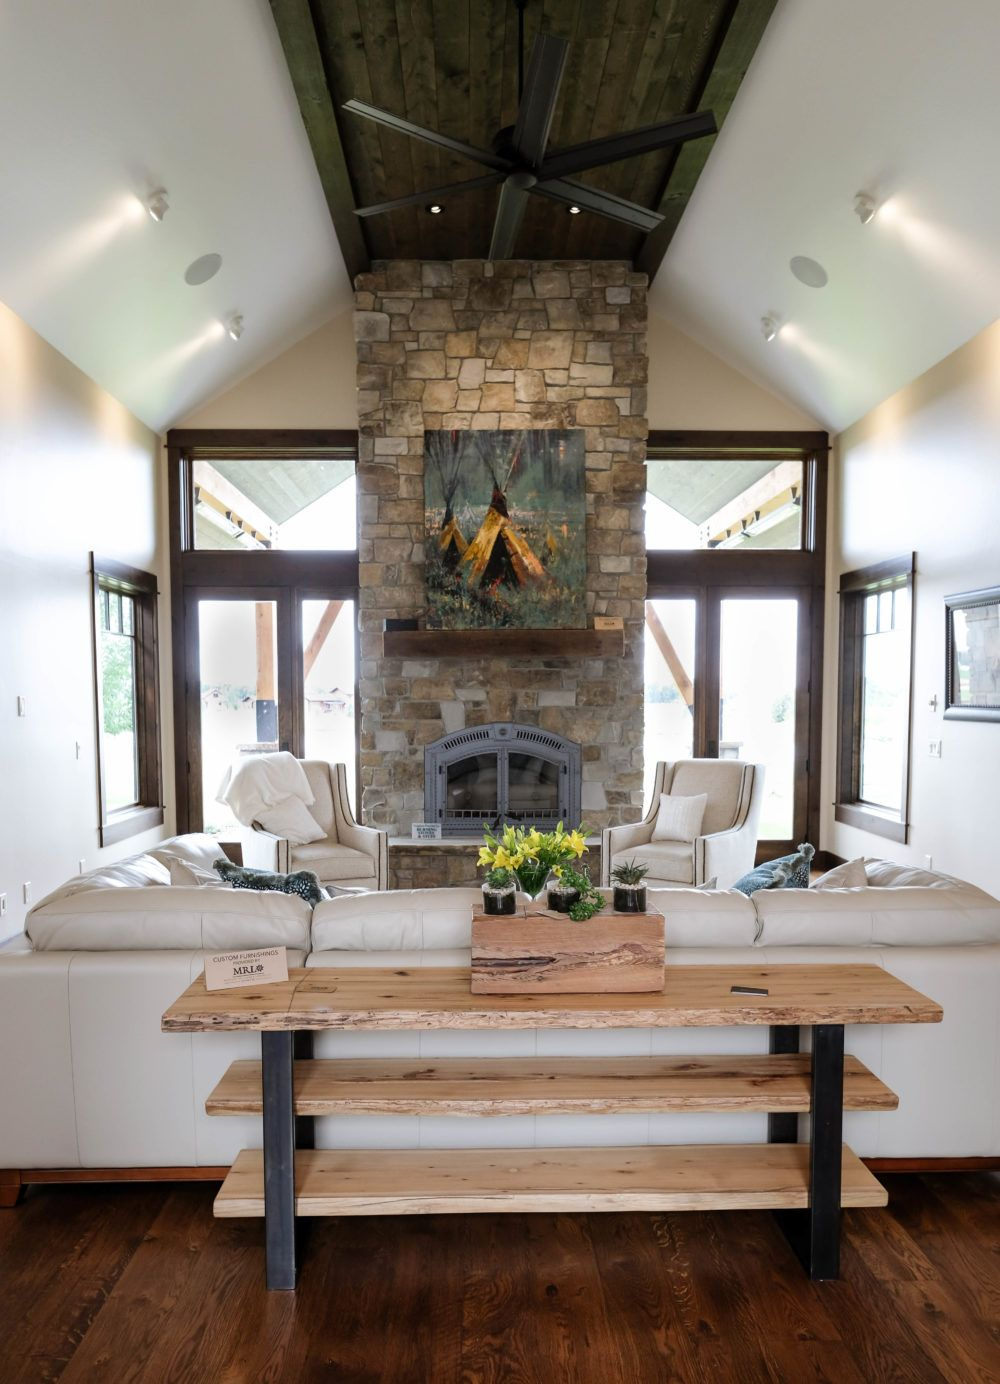 Sitting Room Designs Furniture: Parade Of Homes Interior Favorite Decor Trends